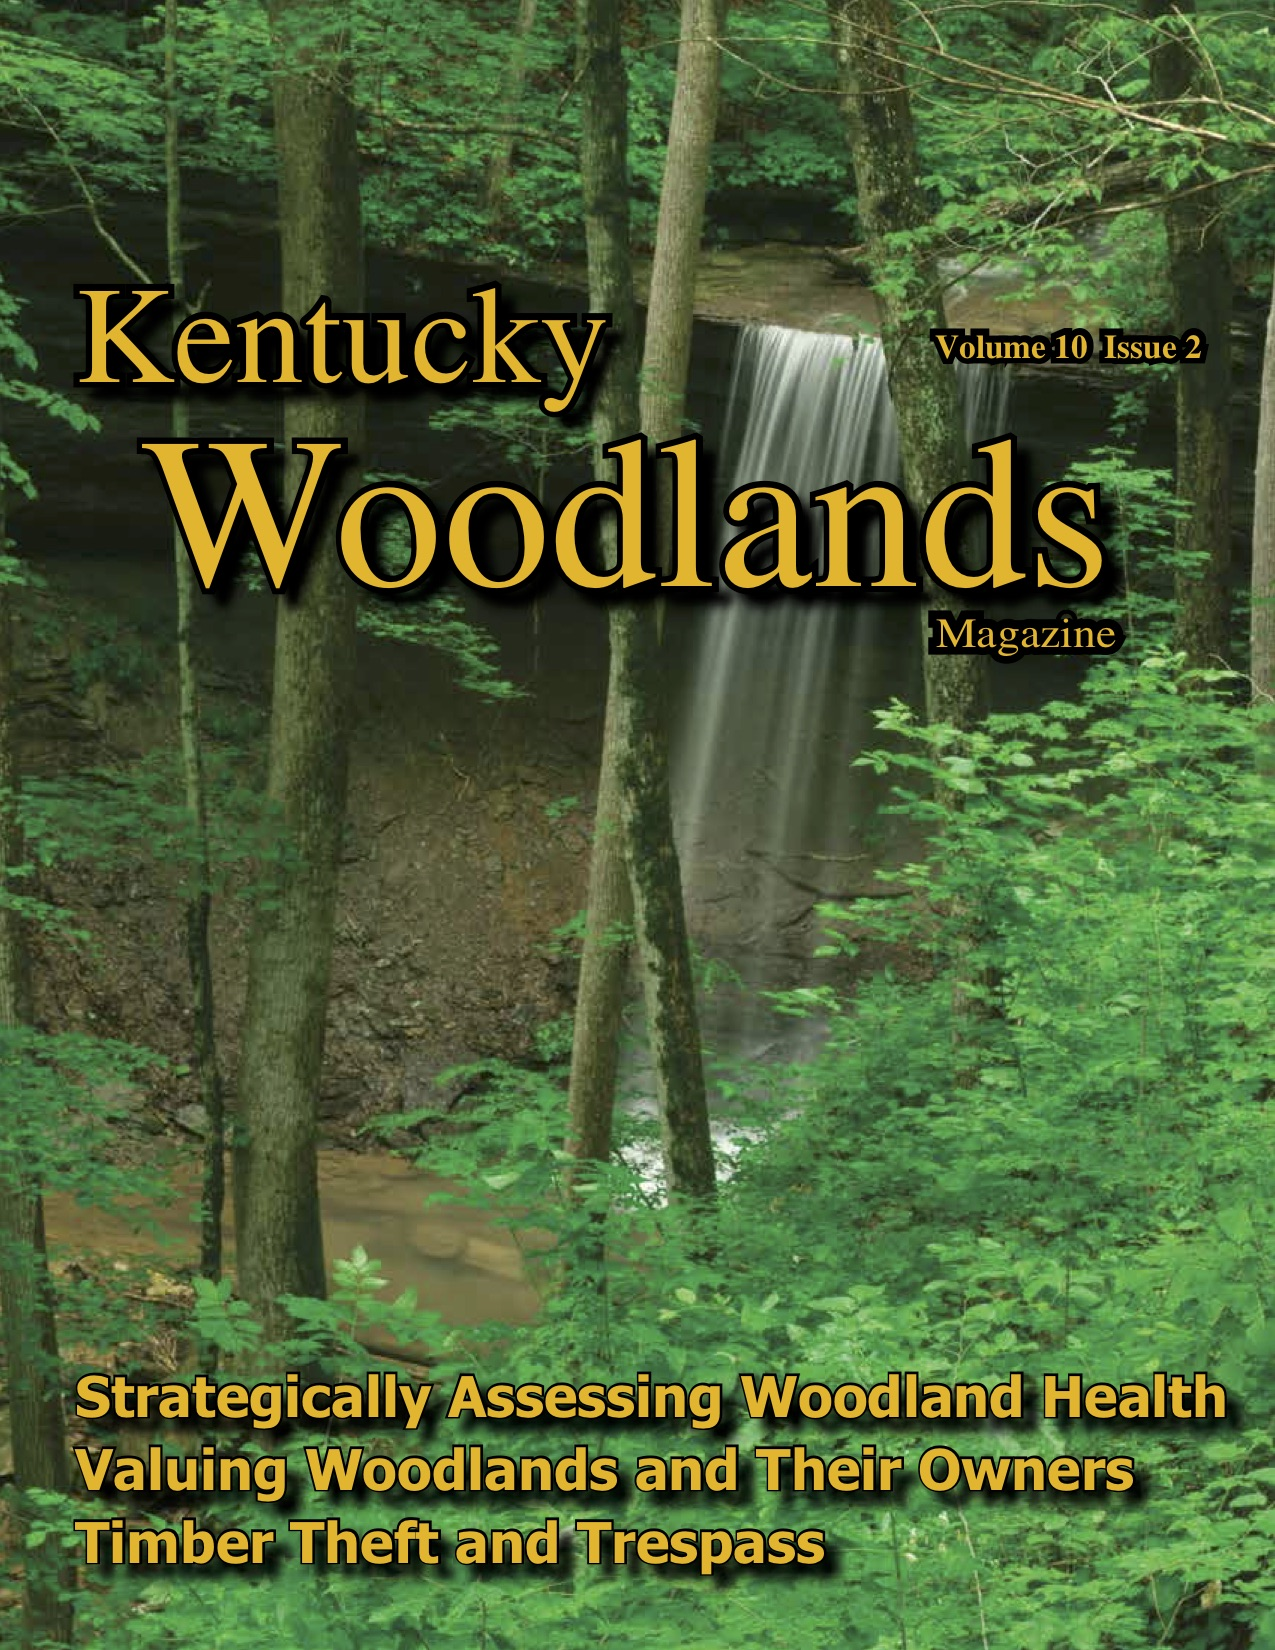 Kentucky Woodland Magazine Cover